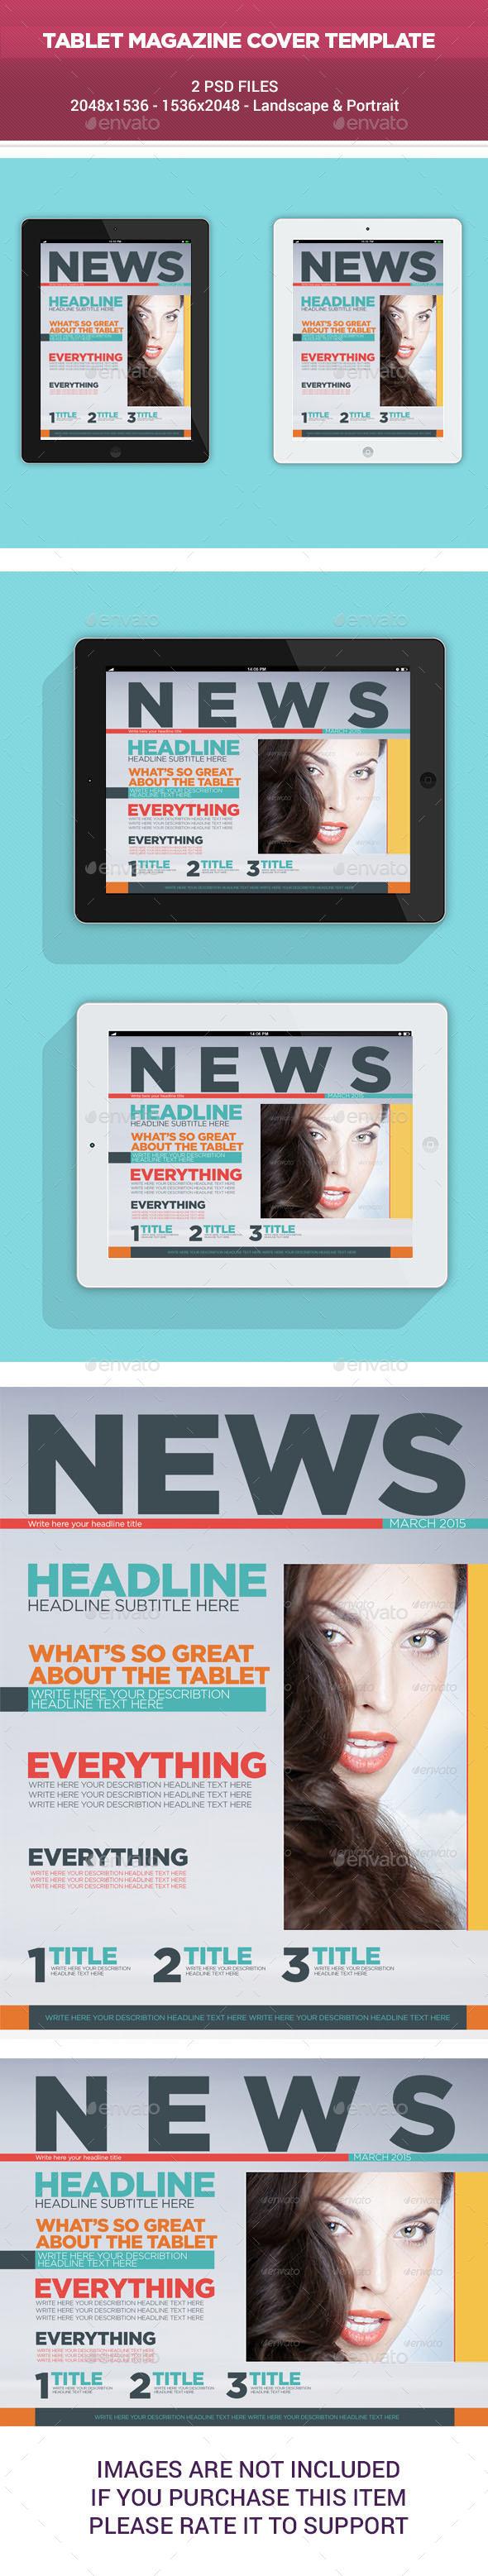 Tablet Magazine Cover Template - Digital Magazines ePublishing